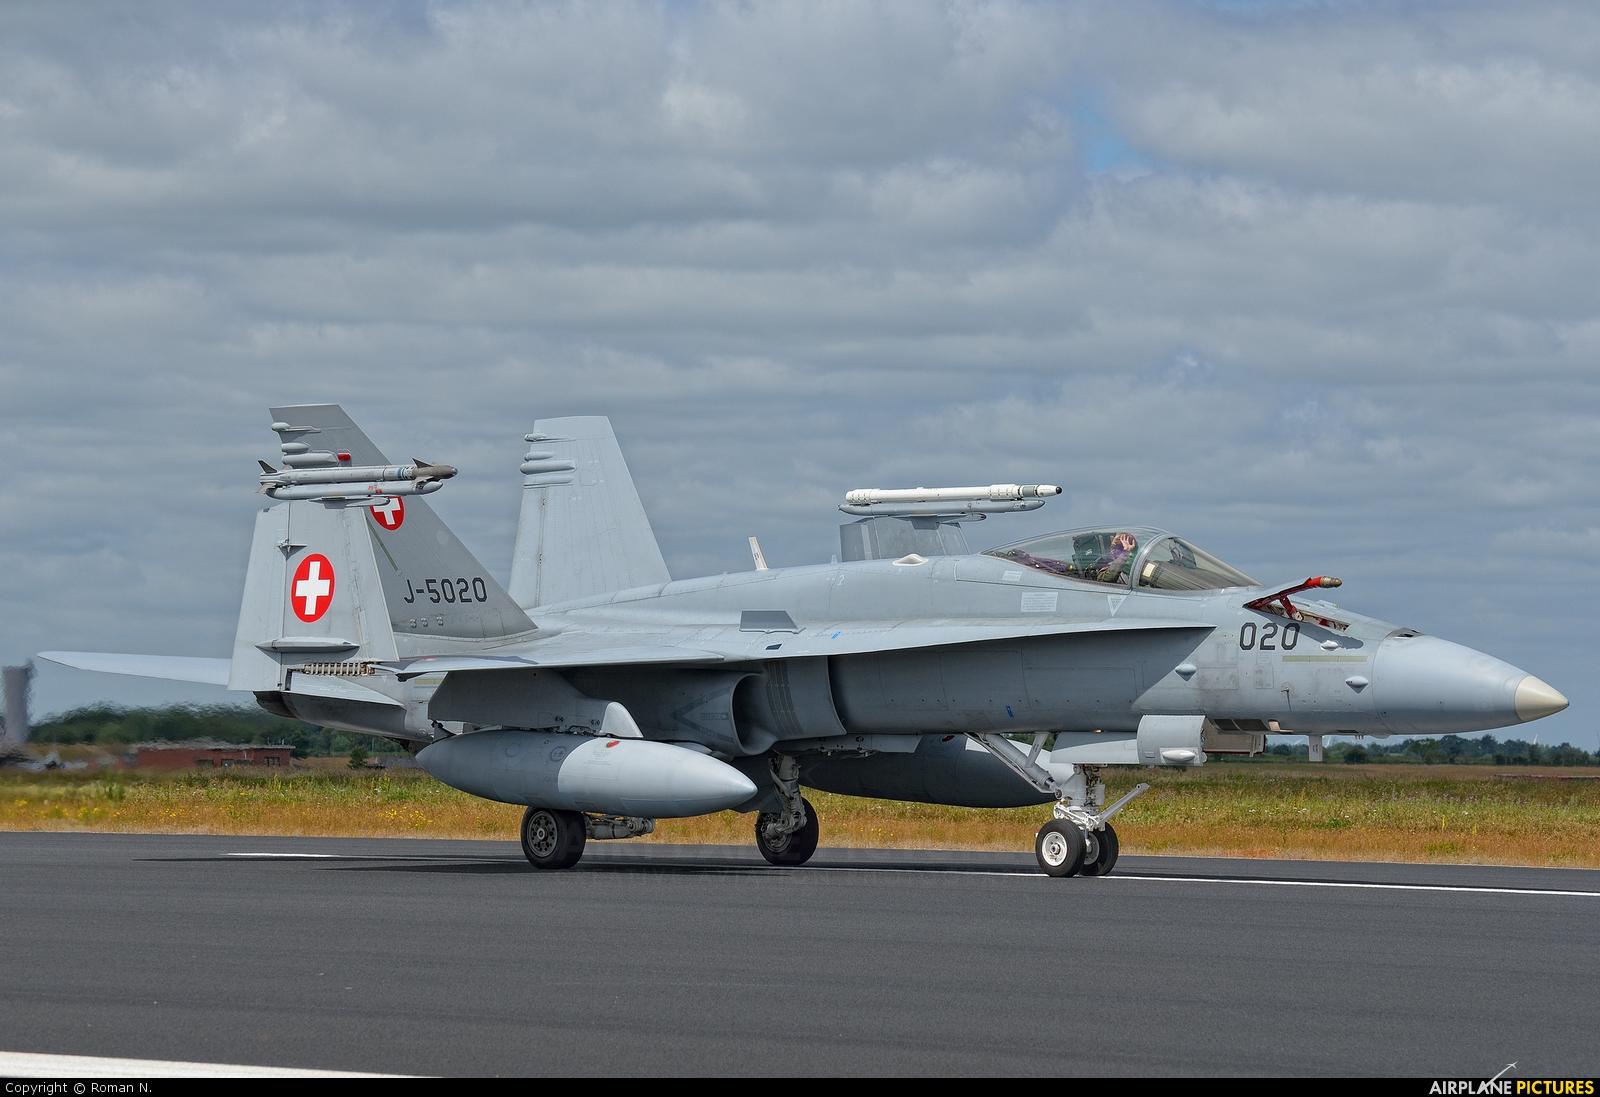 Switzerland - Air Force J-5020 aircraft at Schleswig-Jagel